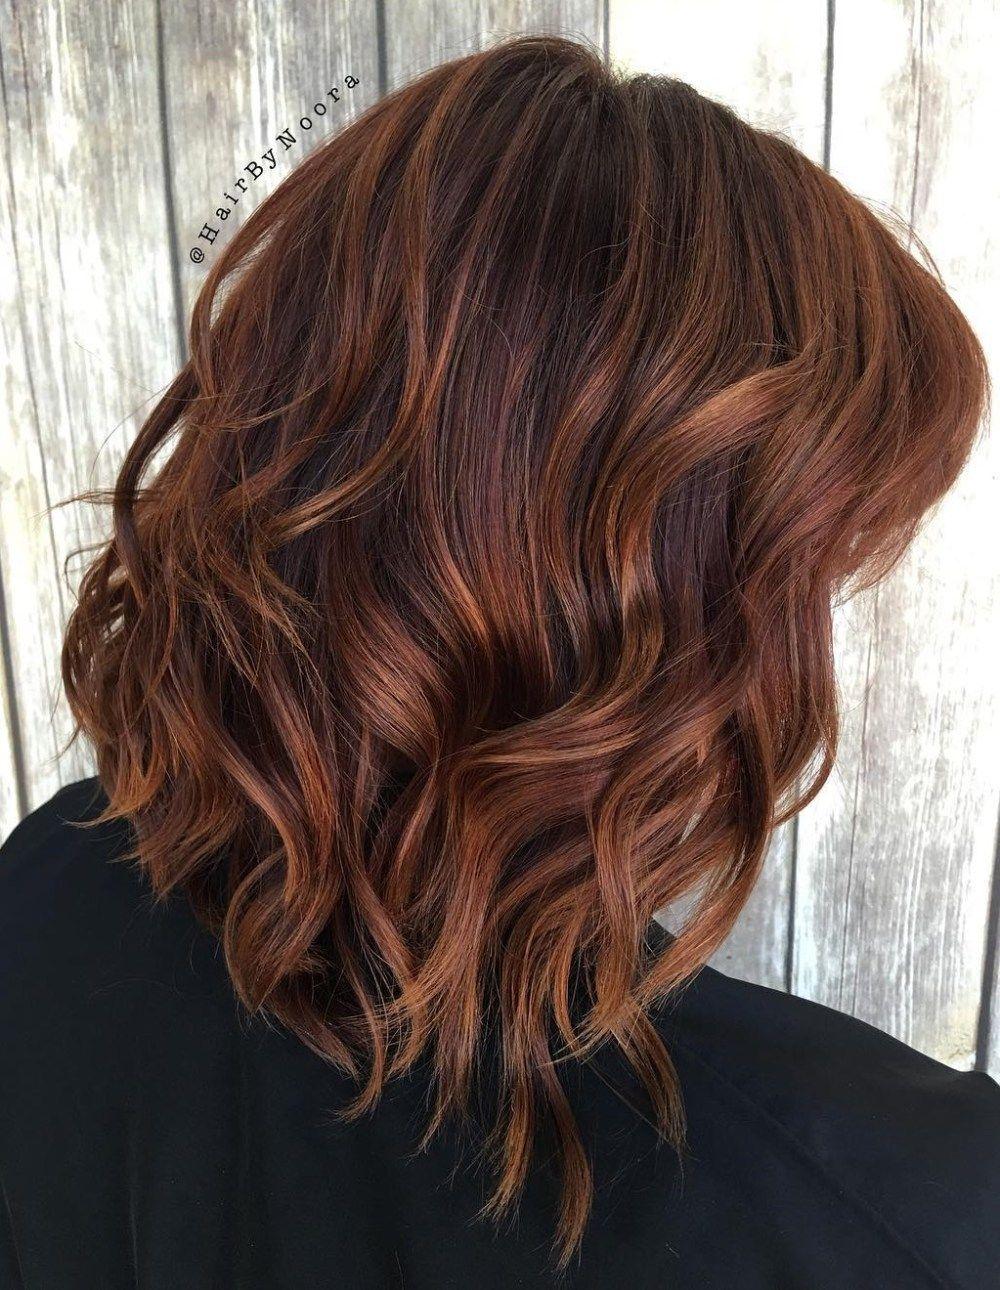 40 Unique Ways To Make Your Chestnut Brown Hair Pop Capelli